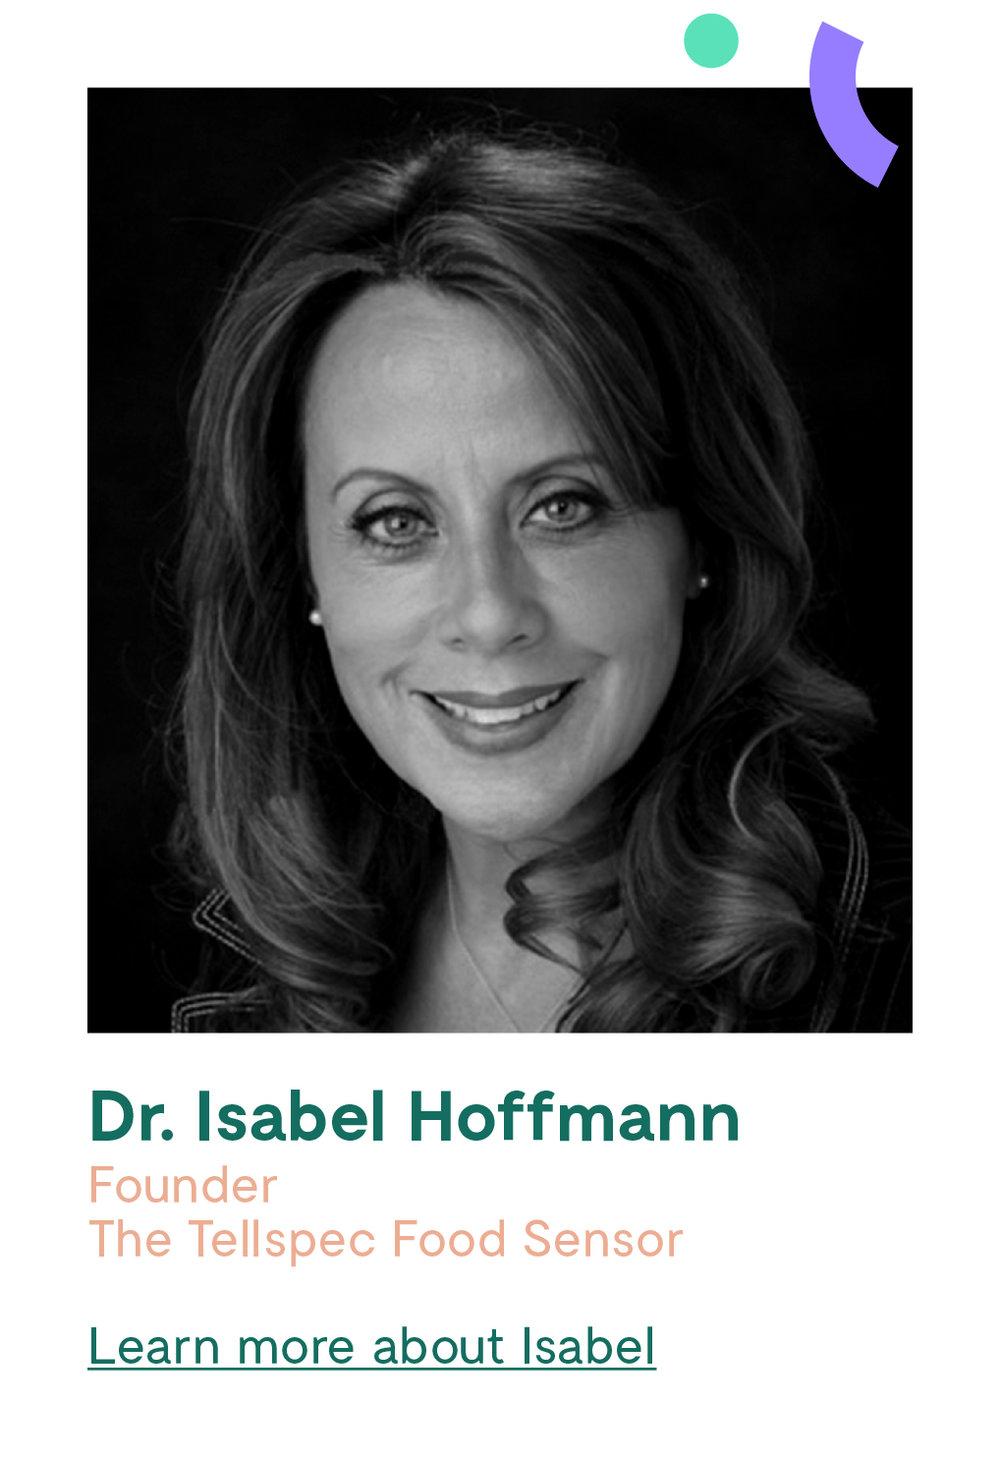 Isabel Hoffman